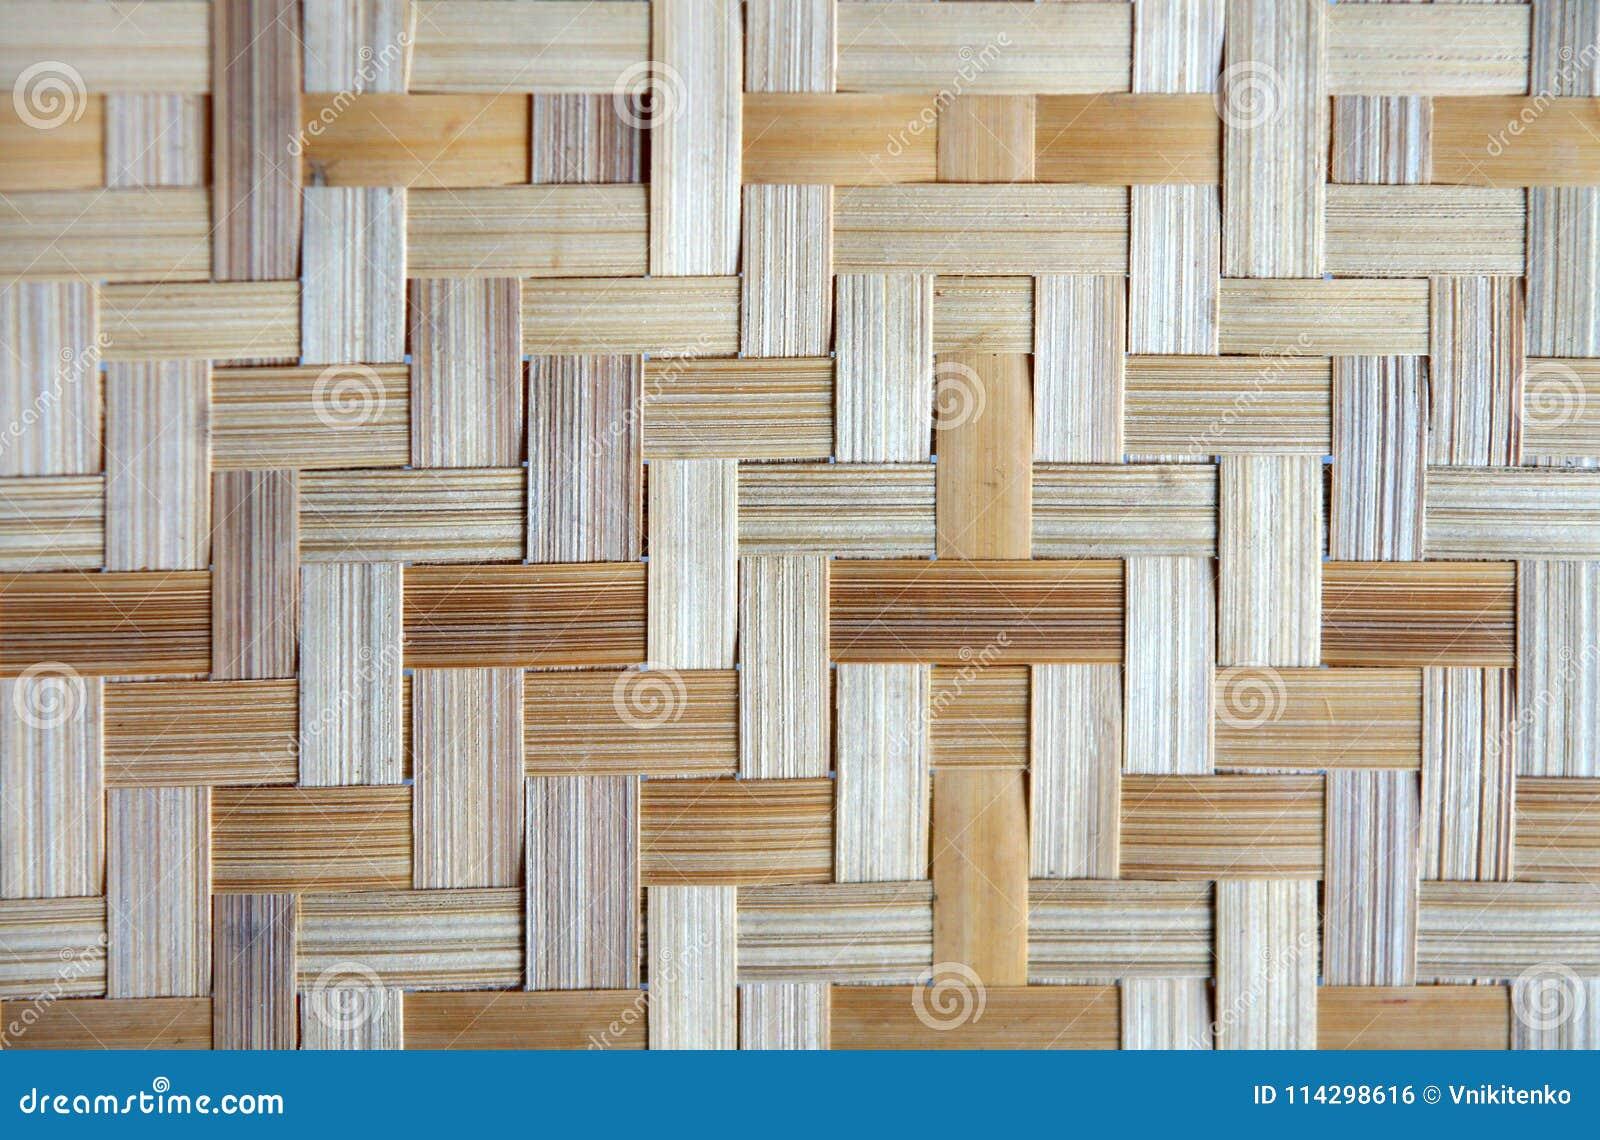 Bamboo Or Straw Weaving Stock Photo Image Of Basket 114298616